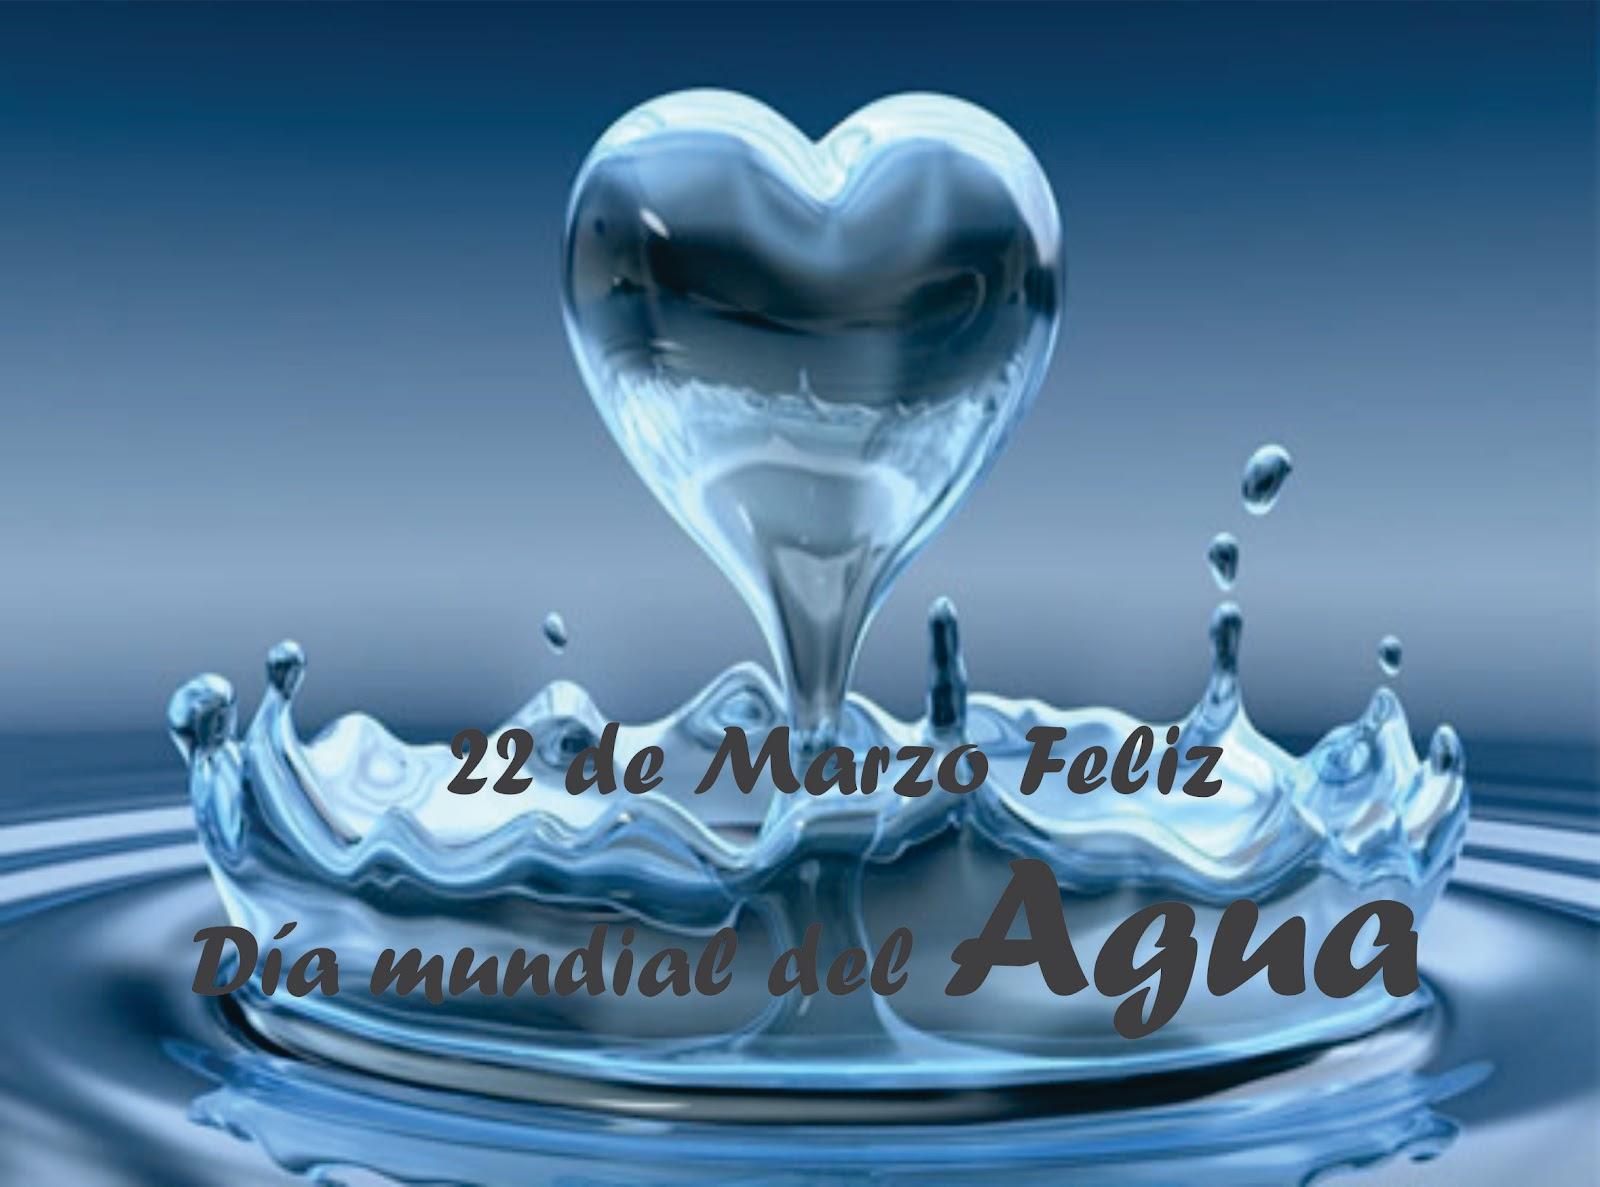 Cual Es Rl Lema Para El Dia Mundial Del Agua 2015 | Efemérides en